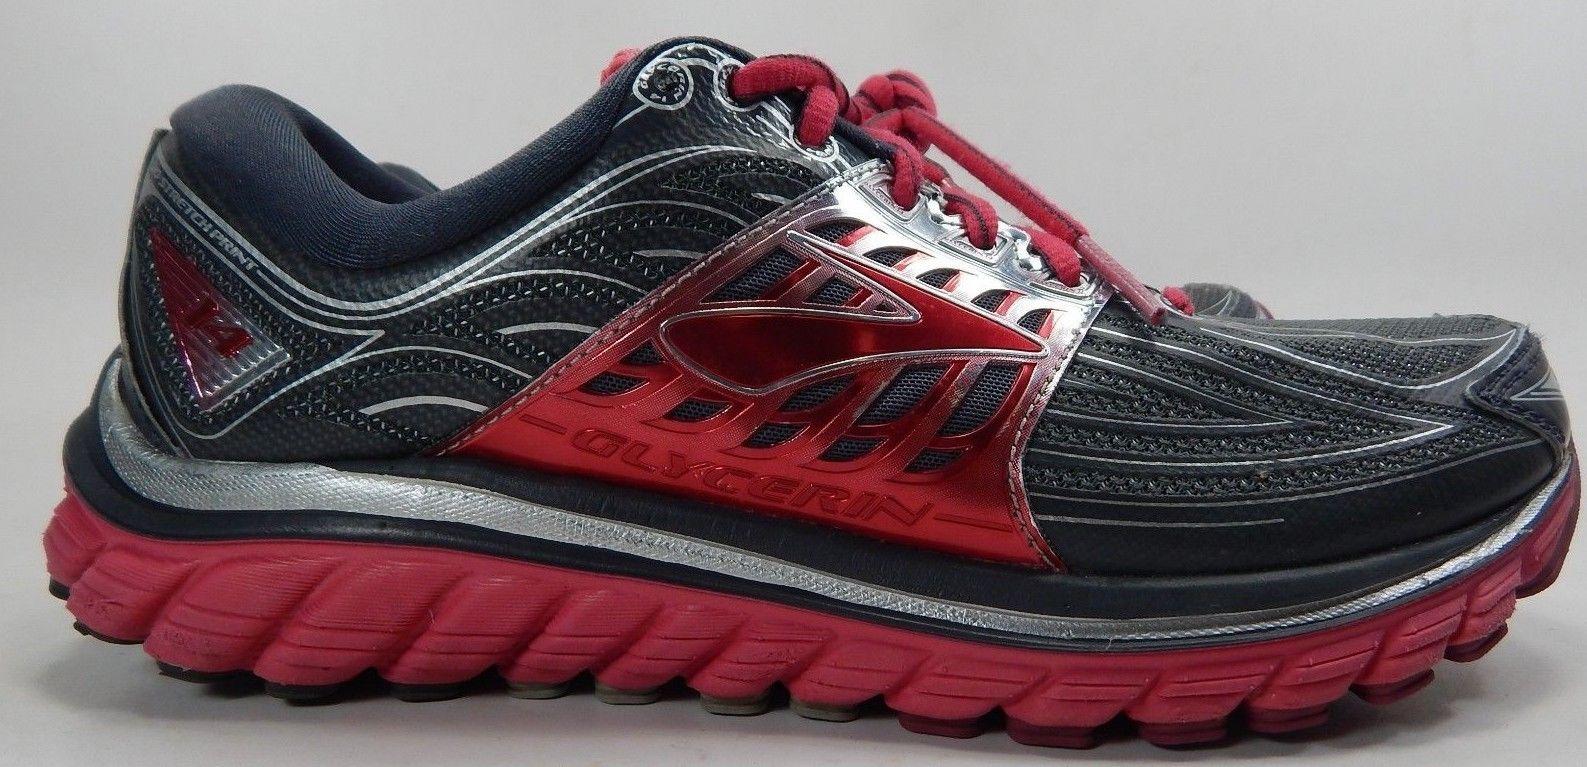 7f3561d732728 Brooks Glycerin 14 Size 9 M (B) EU 40.5 Women s Running Shoes ...